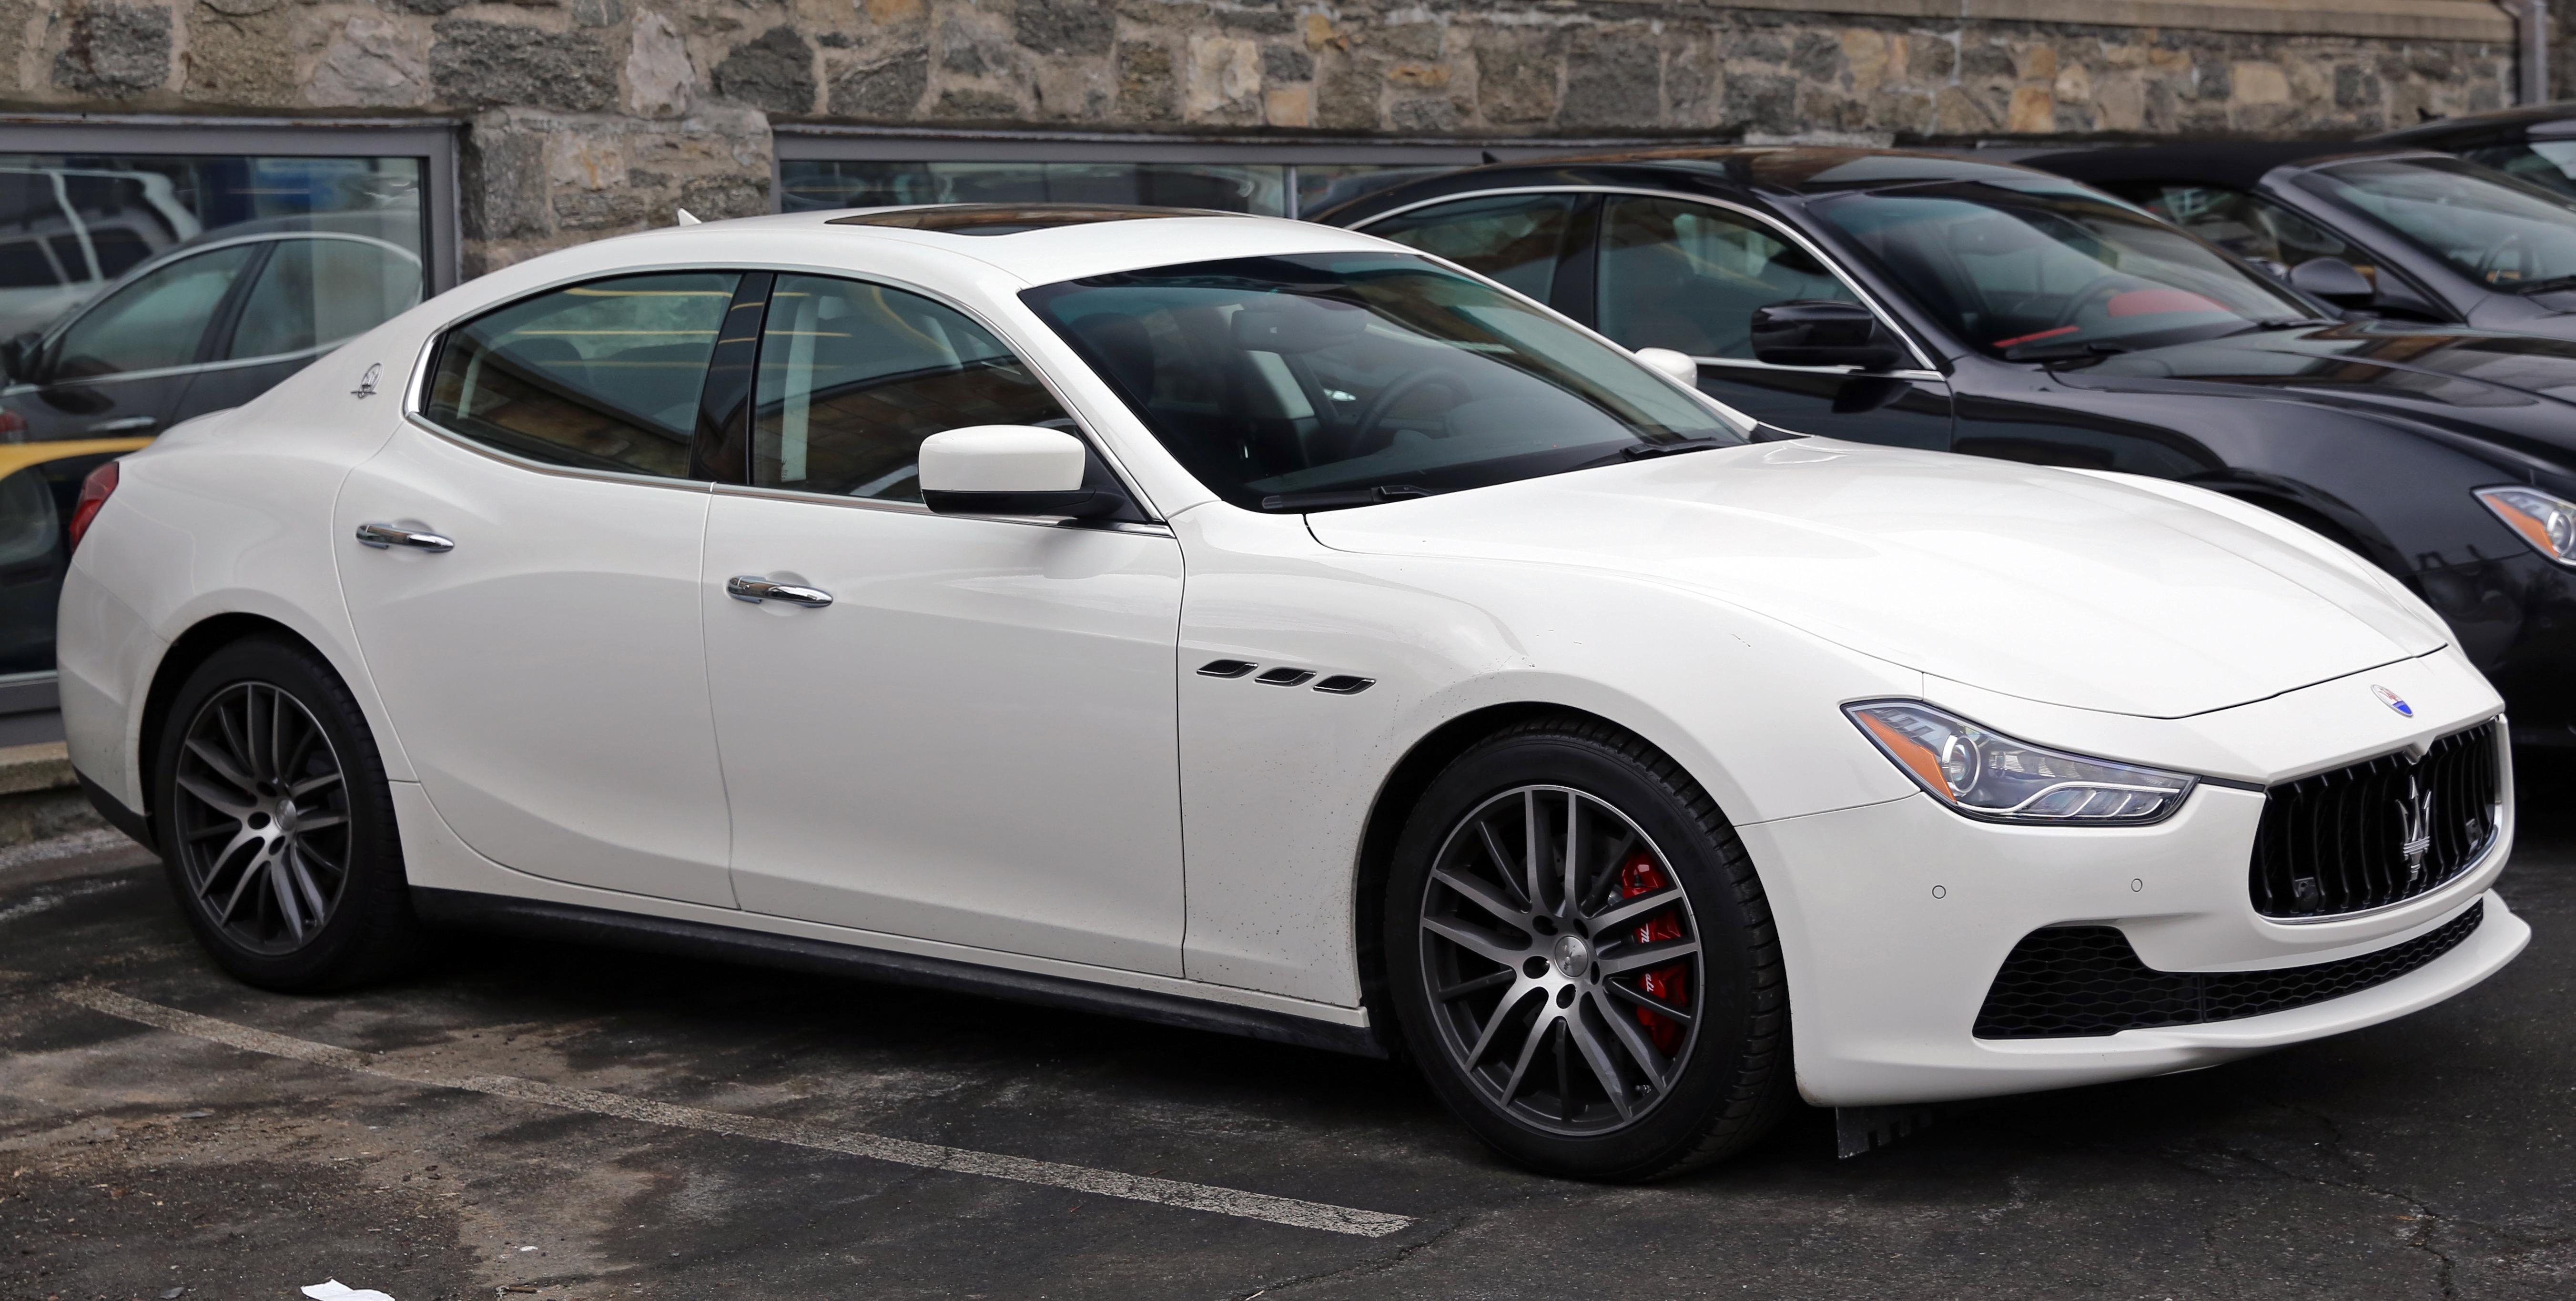 Enterprise Luxury Cars Chicago